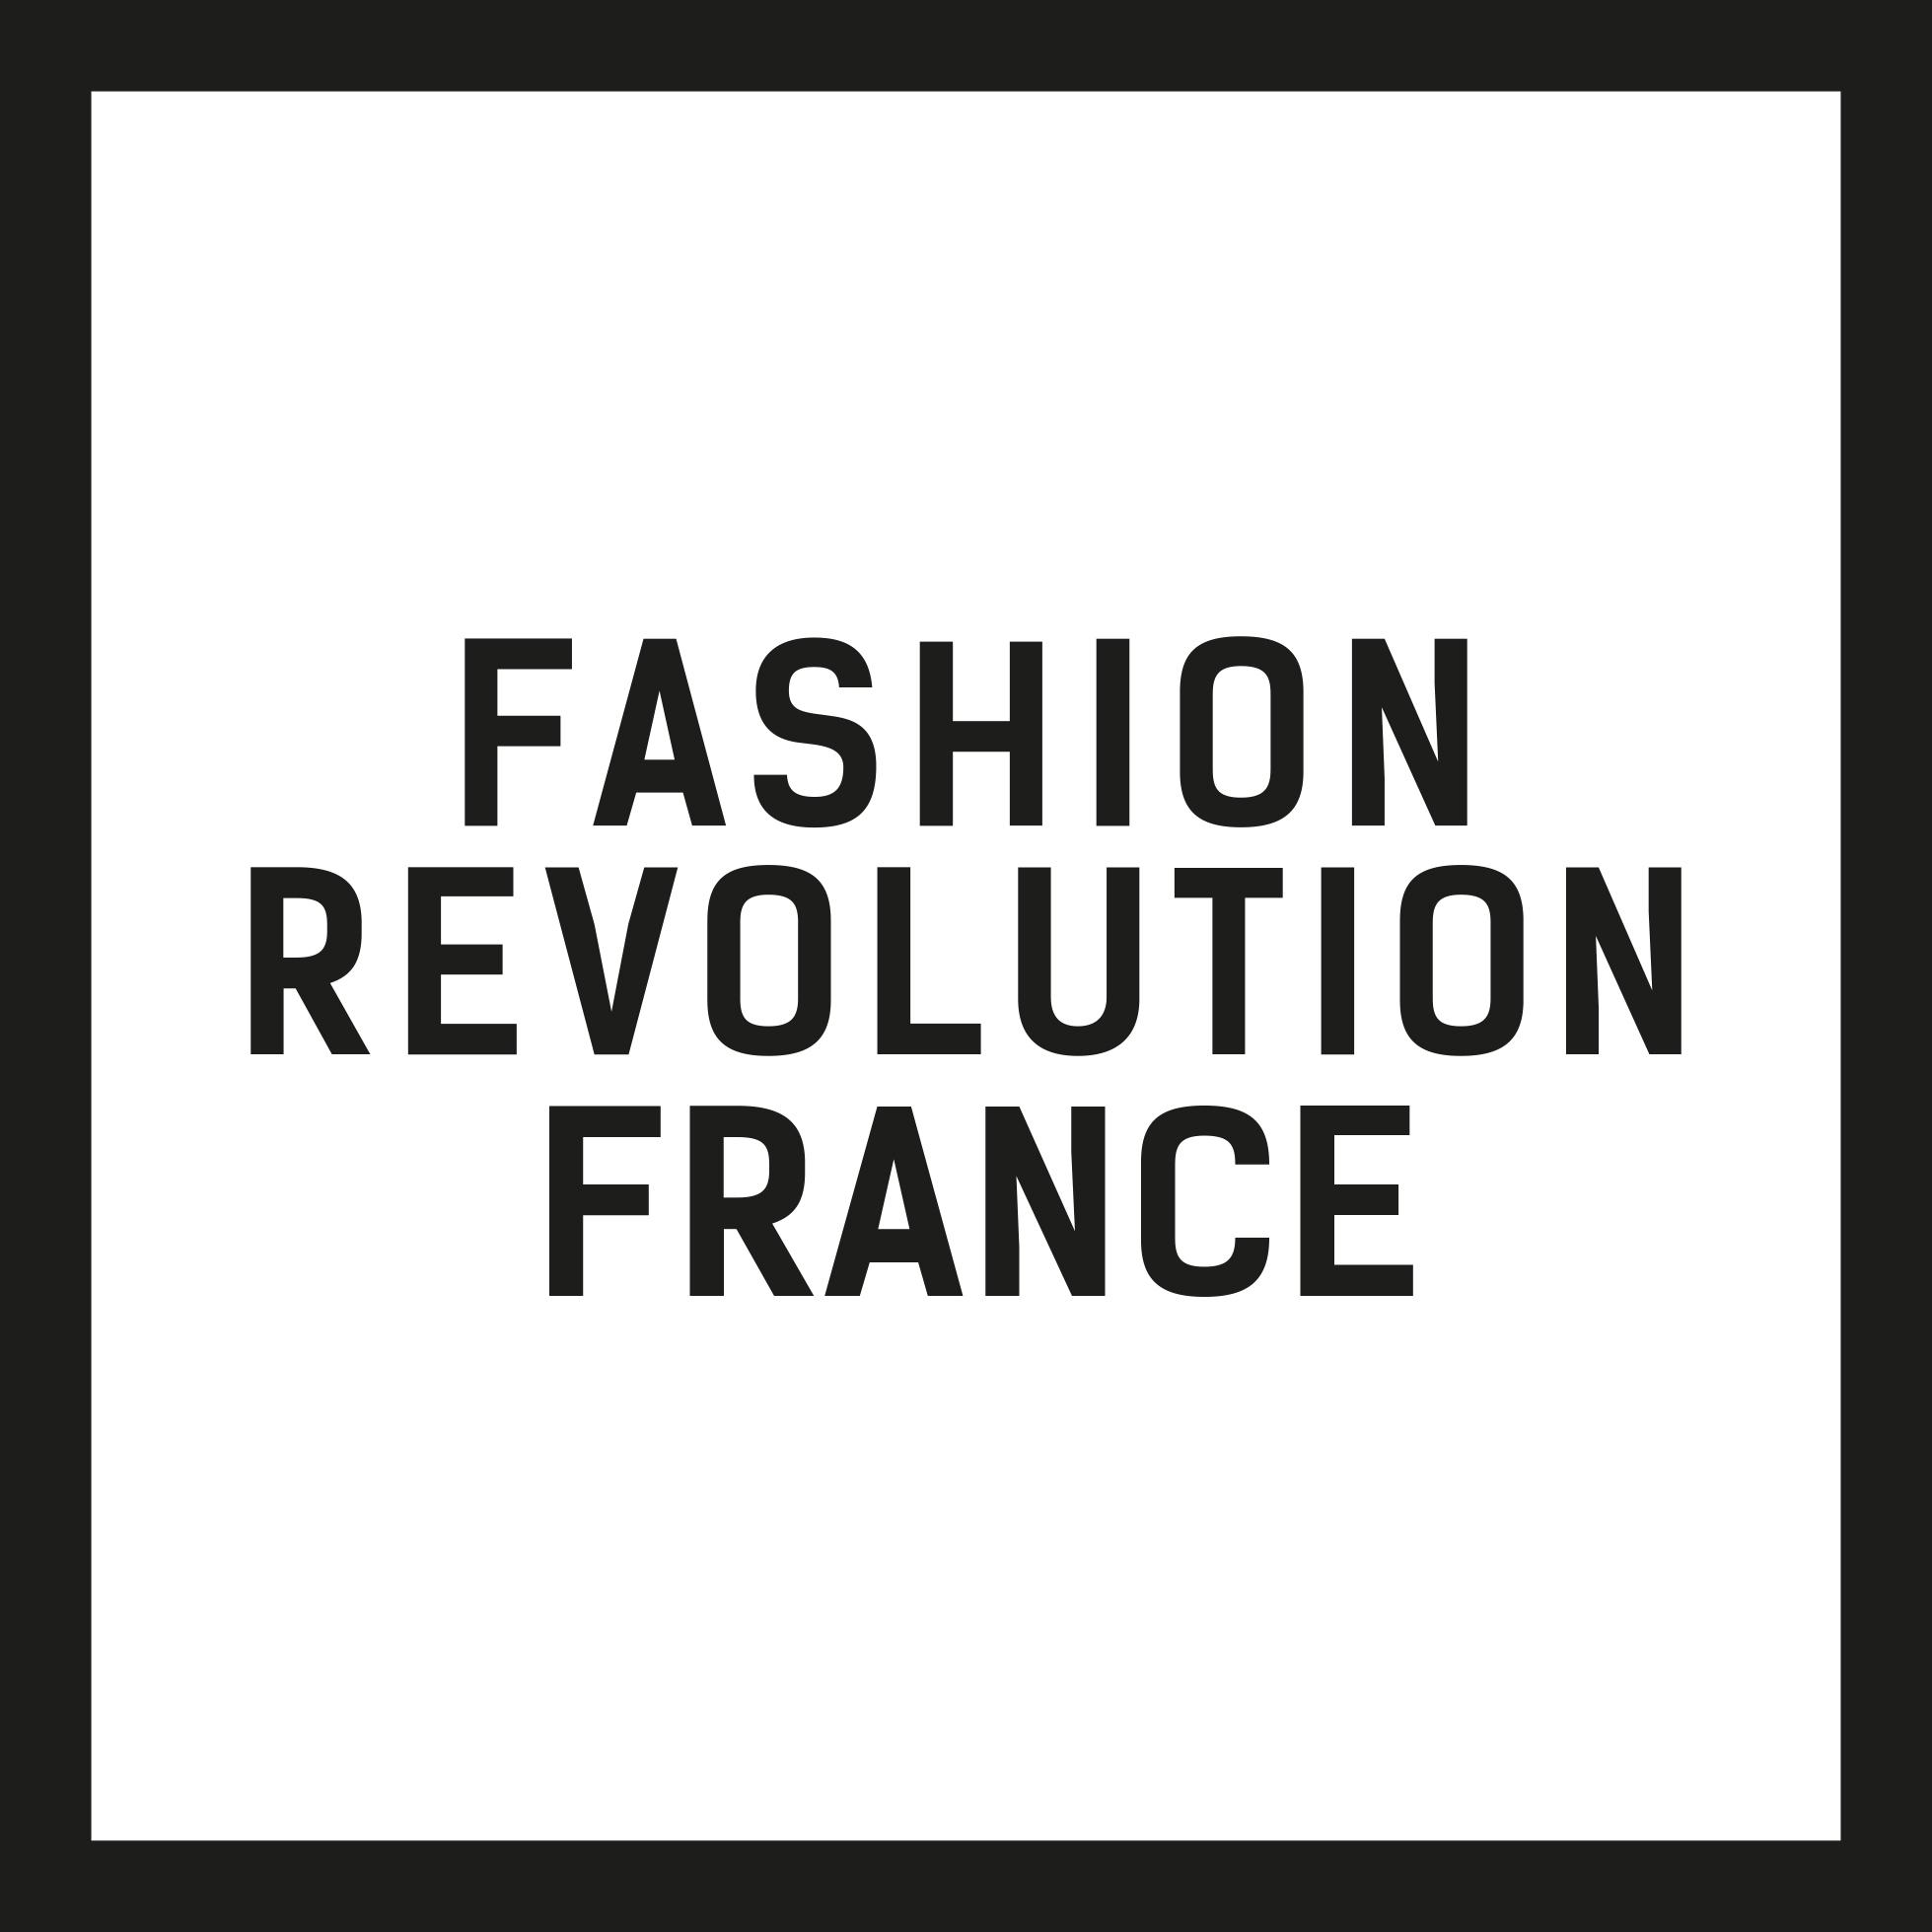 fashion revolution france